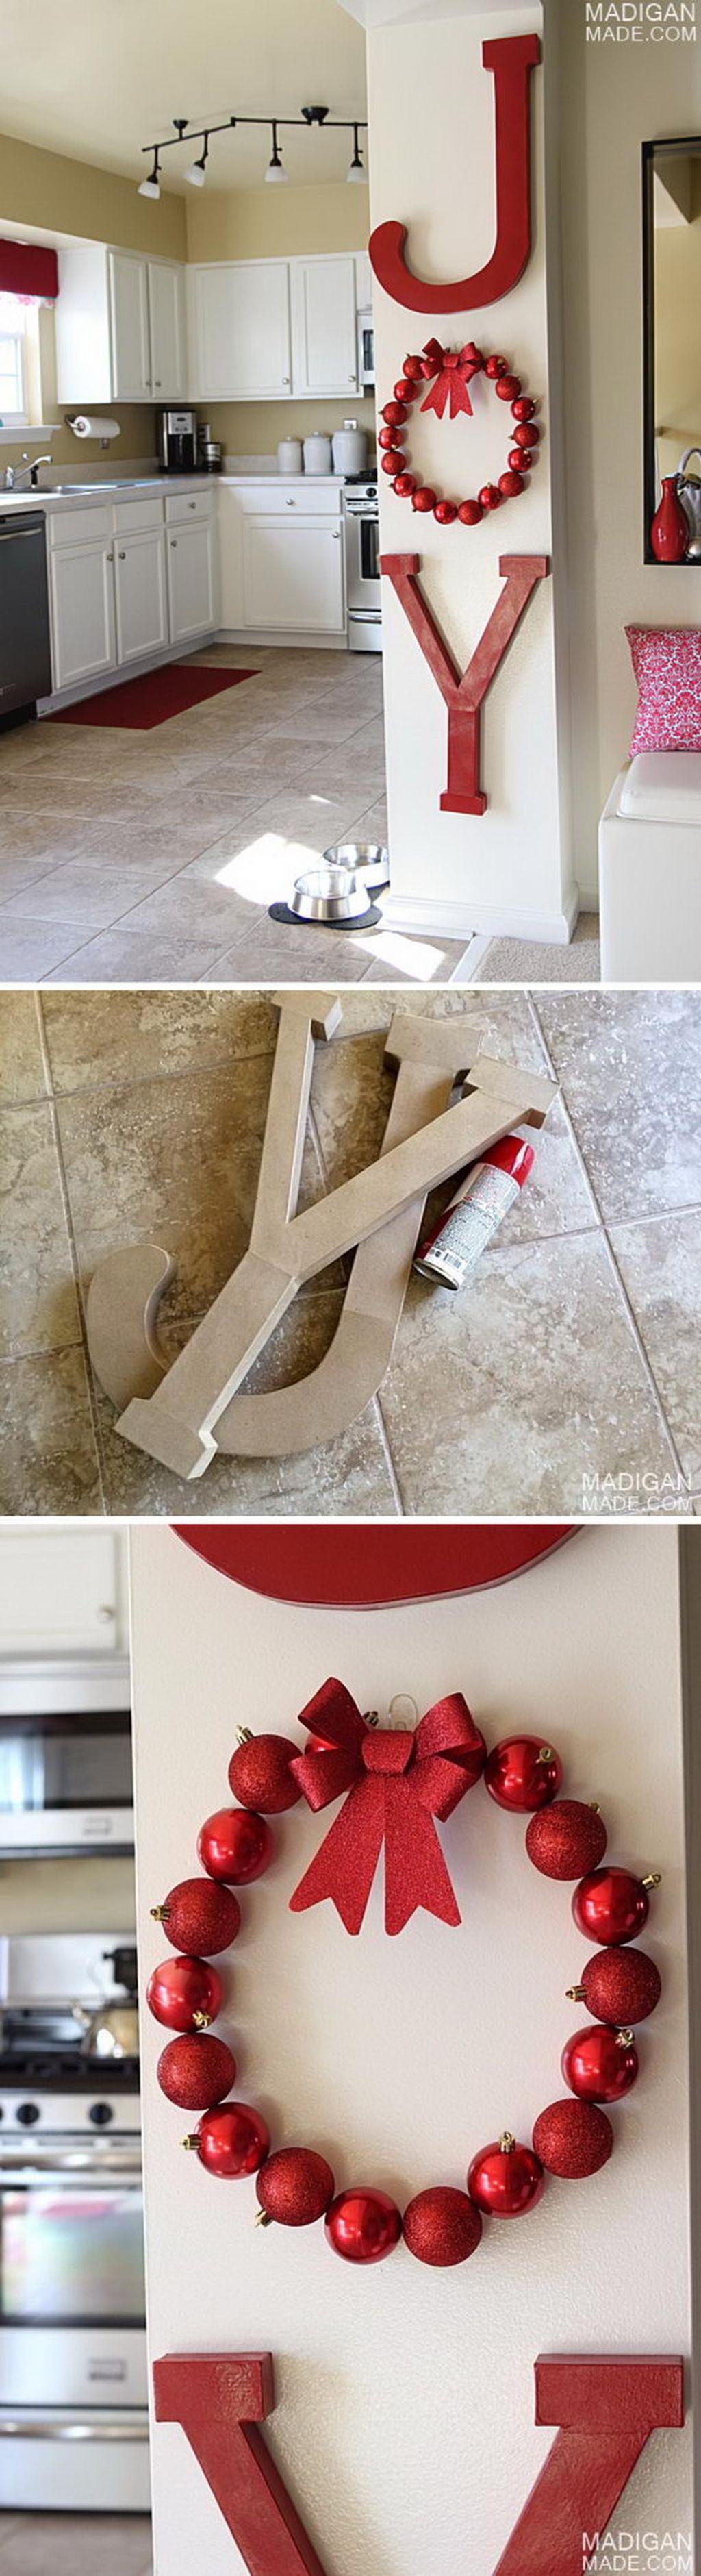 Adorable Rustic Christmas Kitchen Decoration Ideas 73